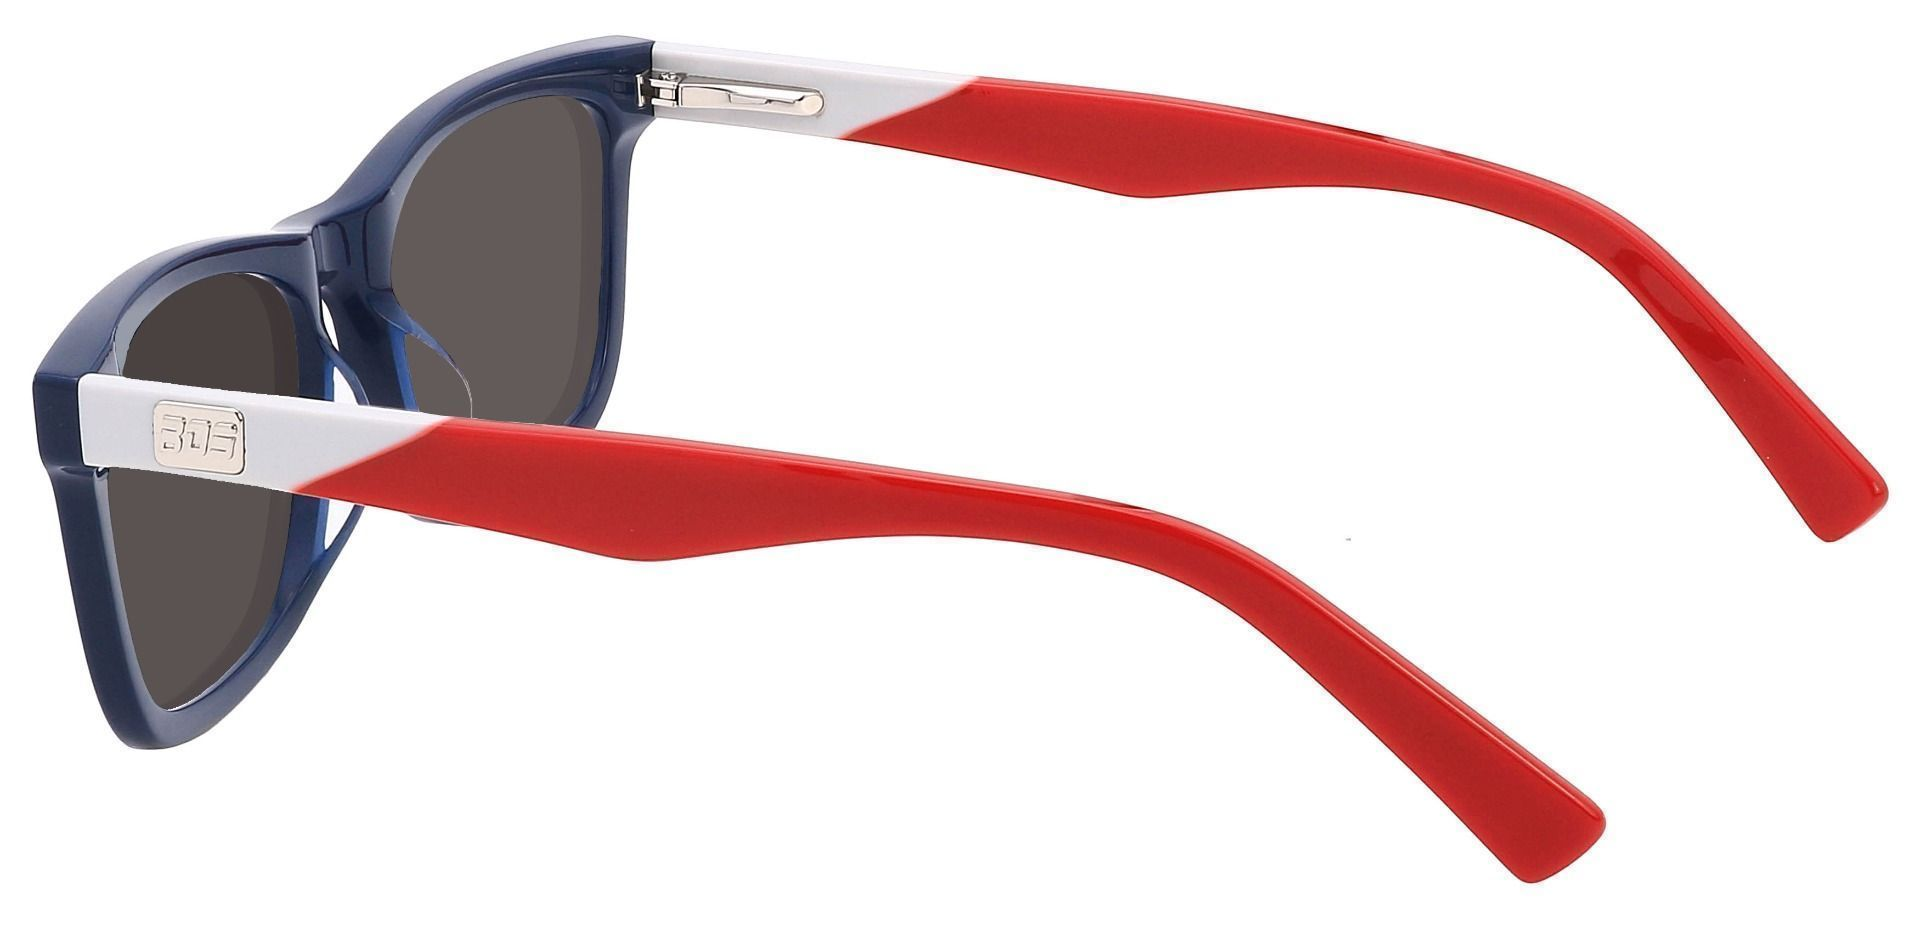 Newbury Rectangle Reading Sunglasses - Blue Frame With Gray Lenses